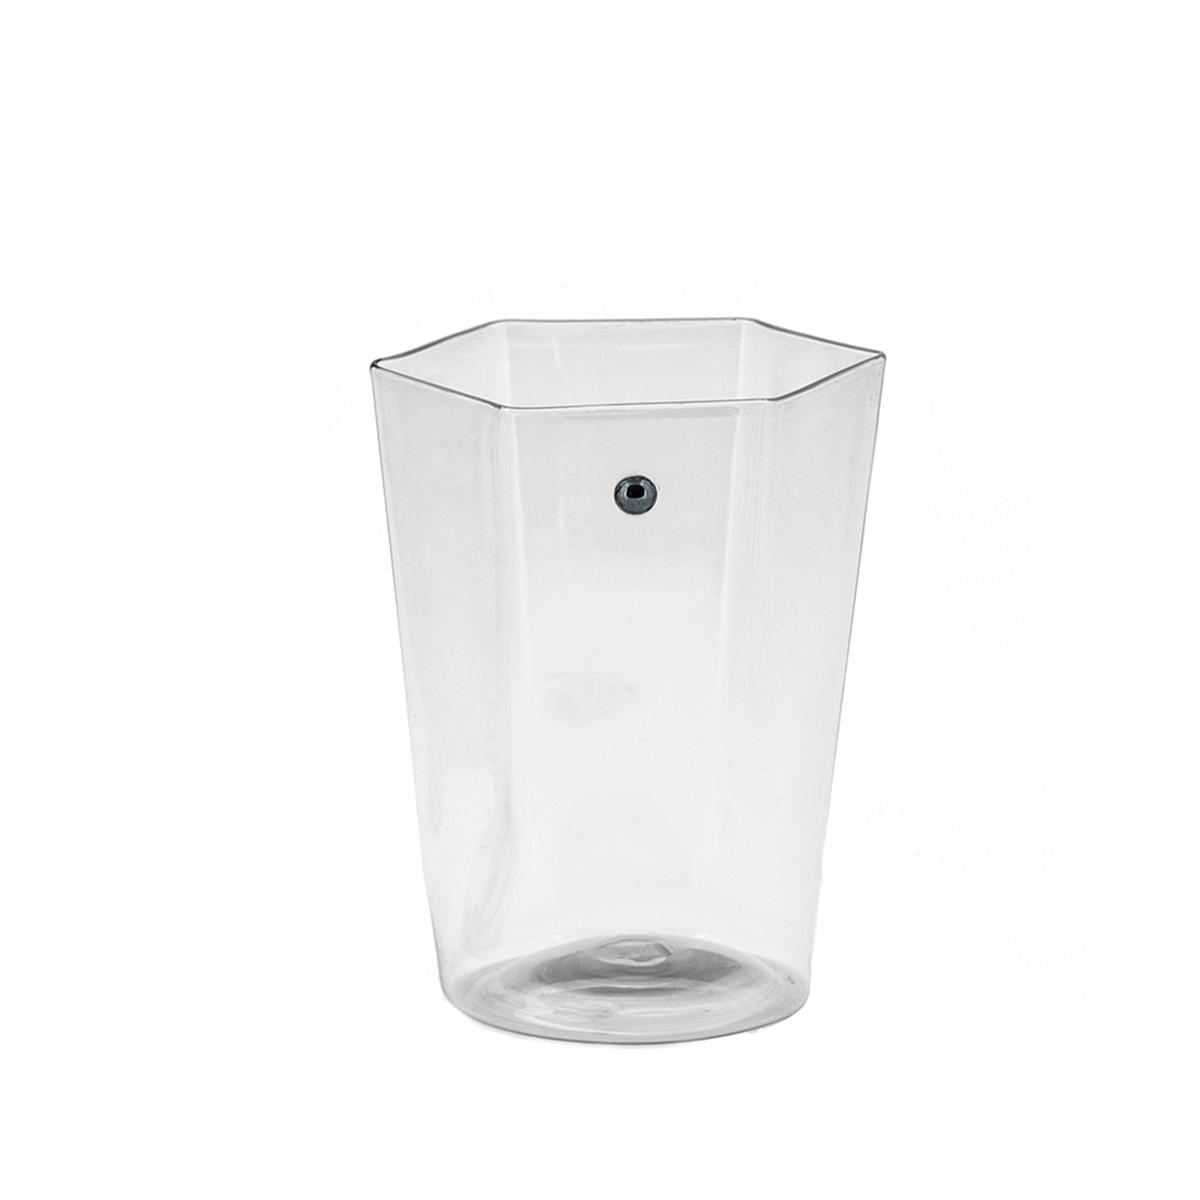 mafalda_glass_crystal_murano_hand_made_wine_giberto_design_luxury